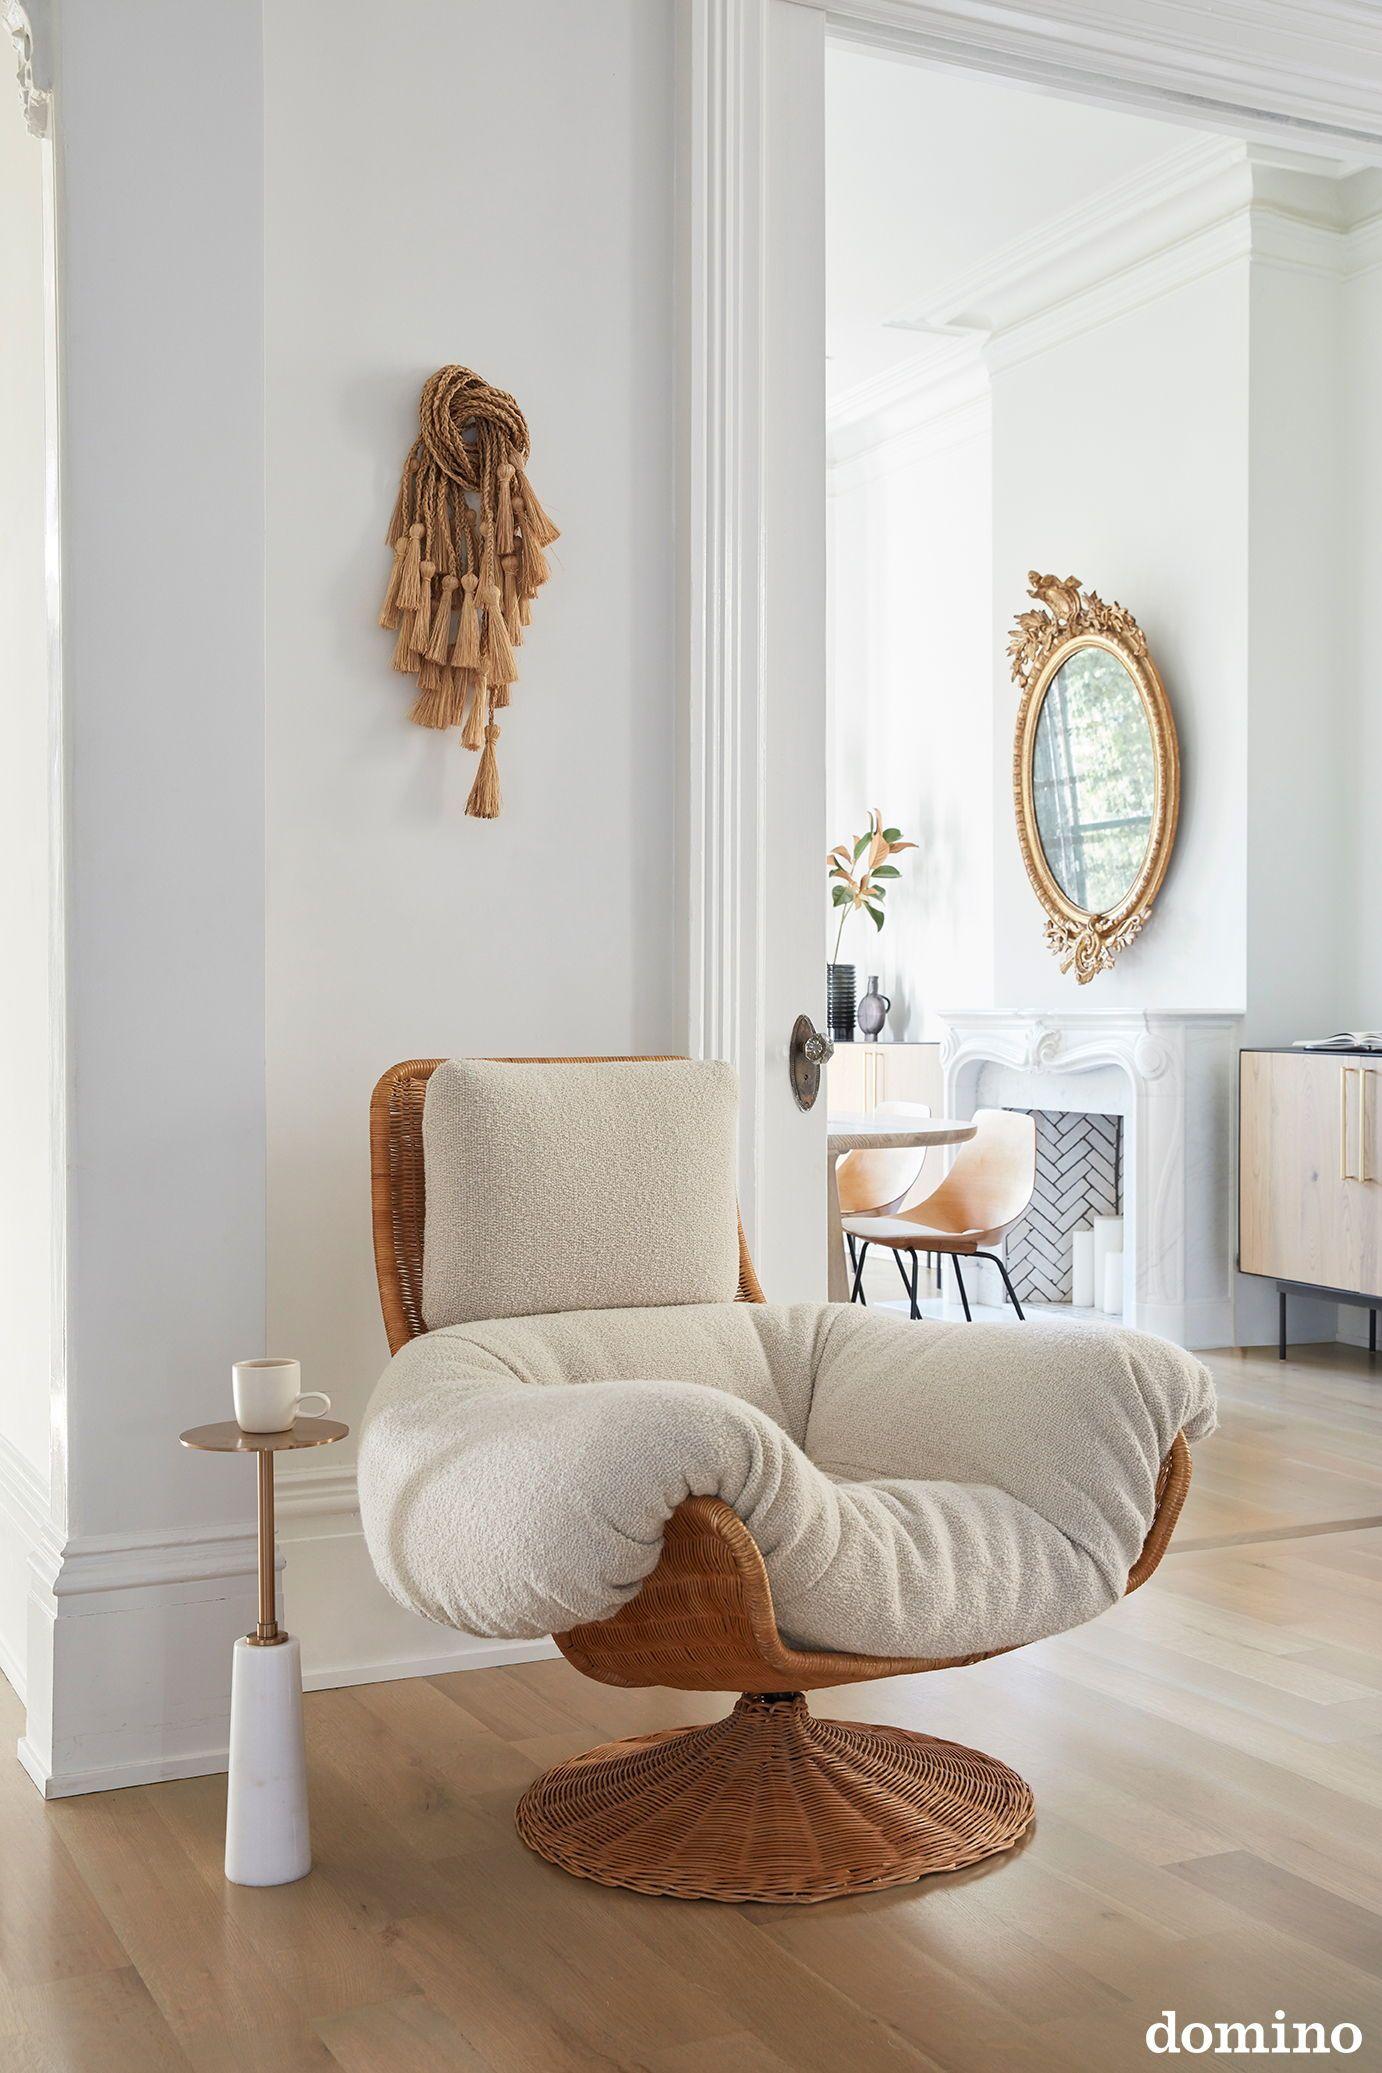 Idee Renovation Salon apt 34 founder erin hiemstra takes us inside her dream